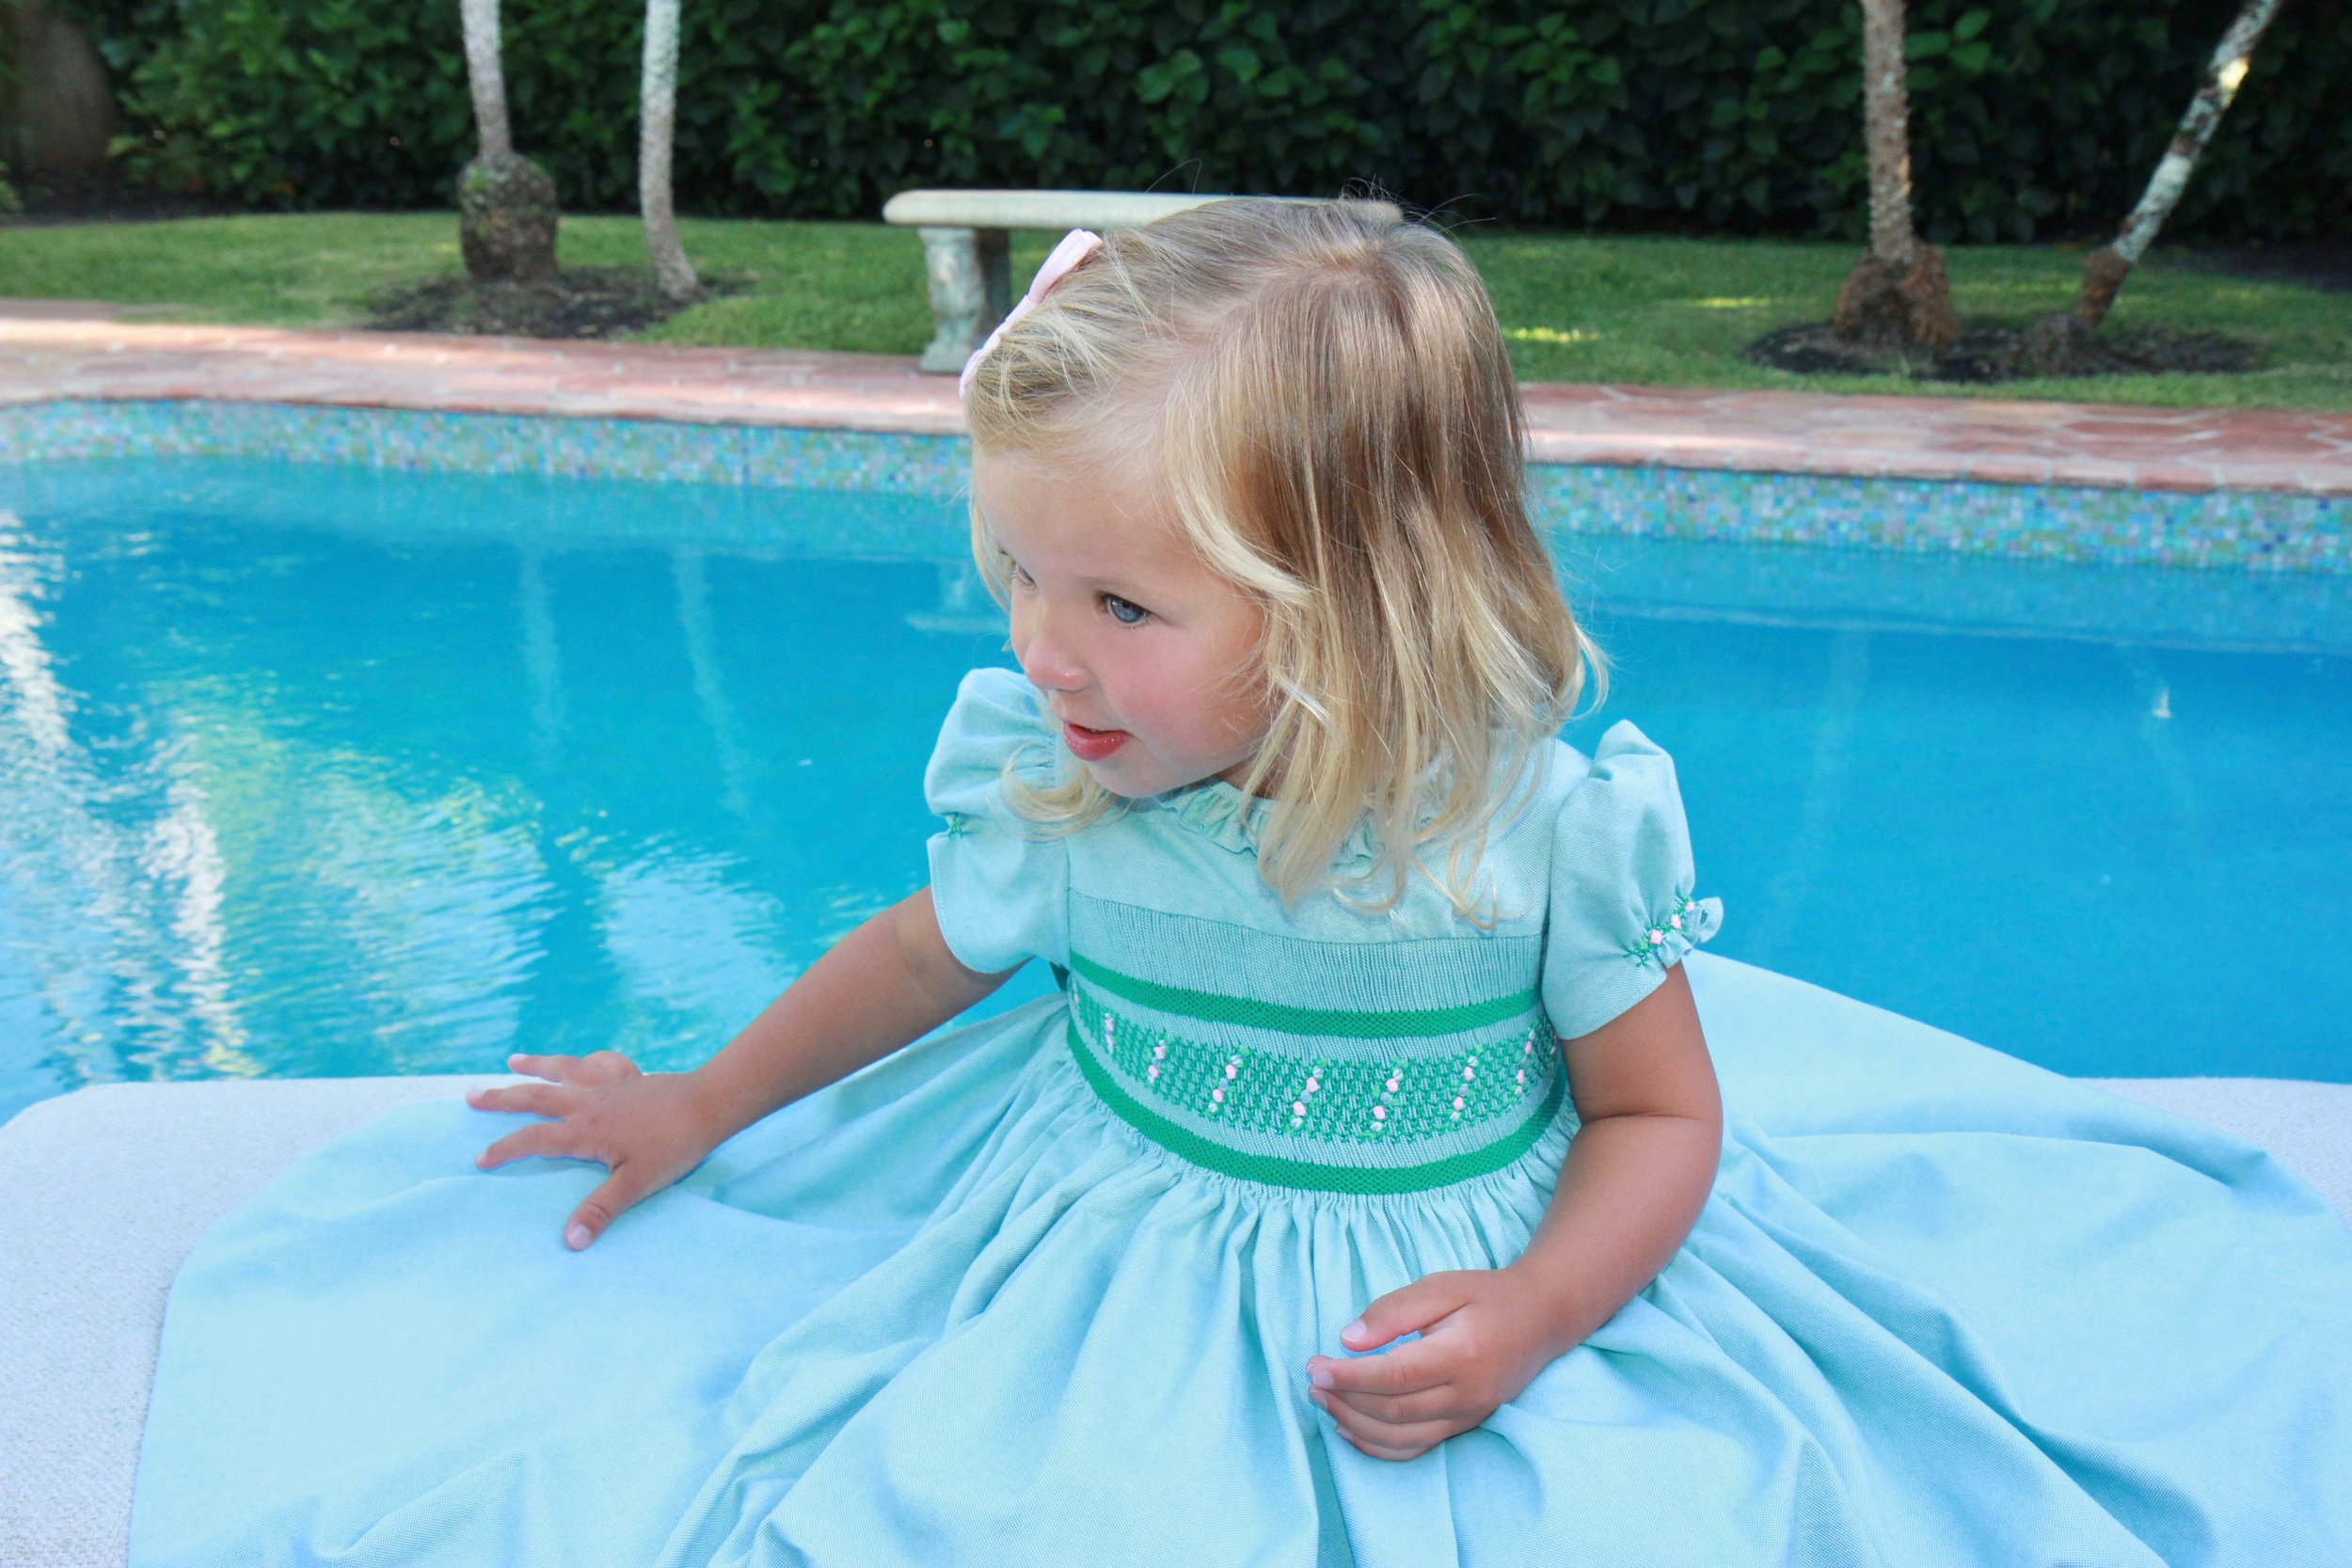 Green Amandine dress